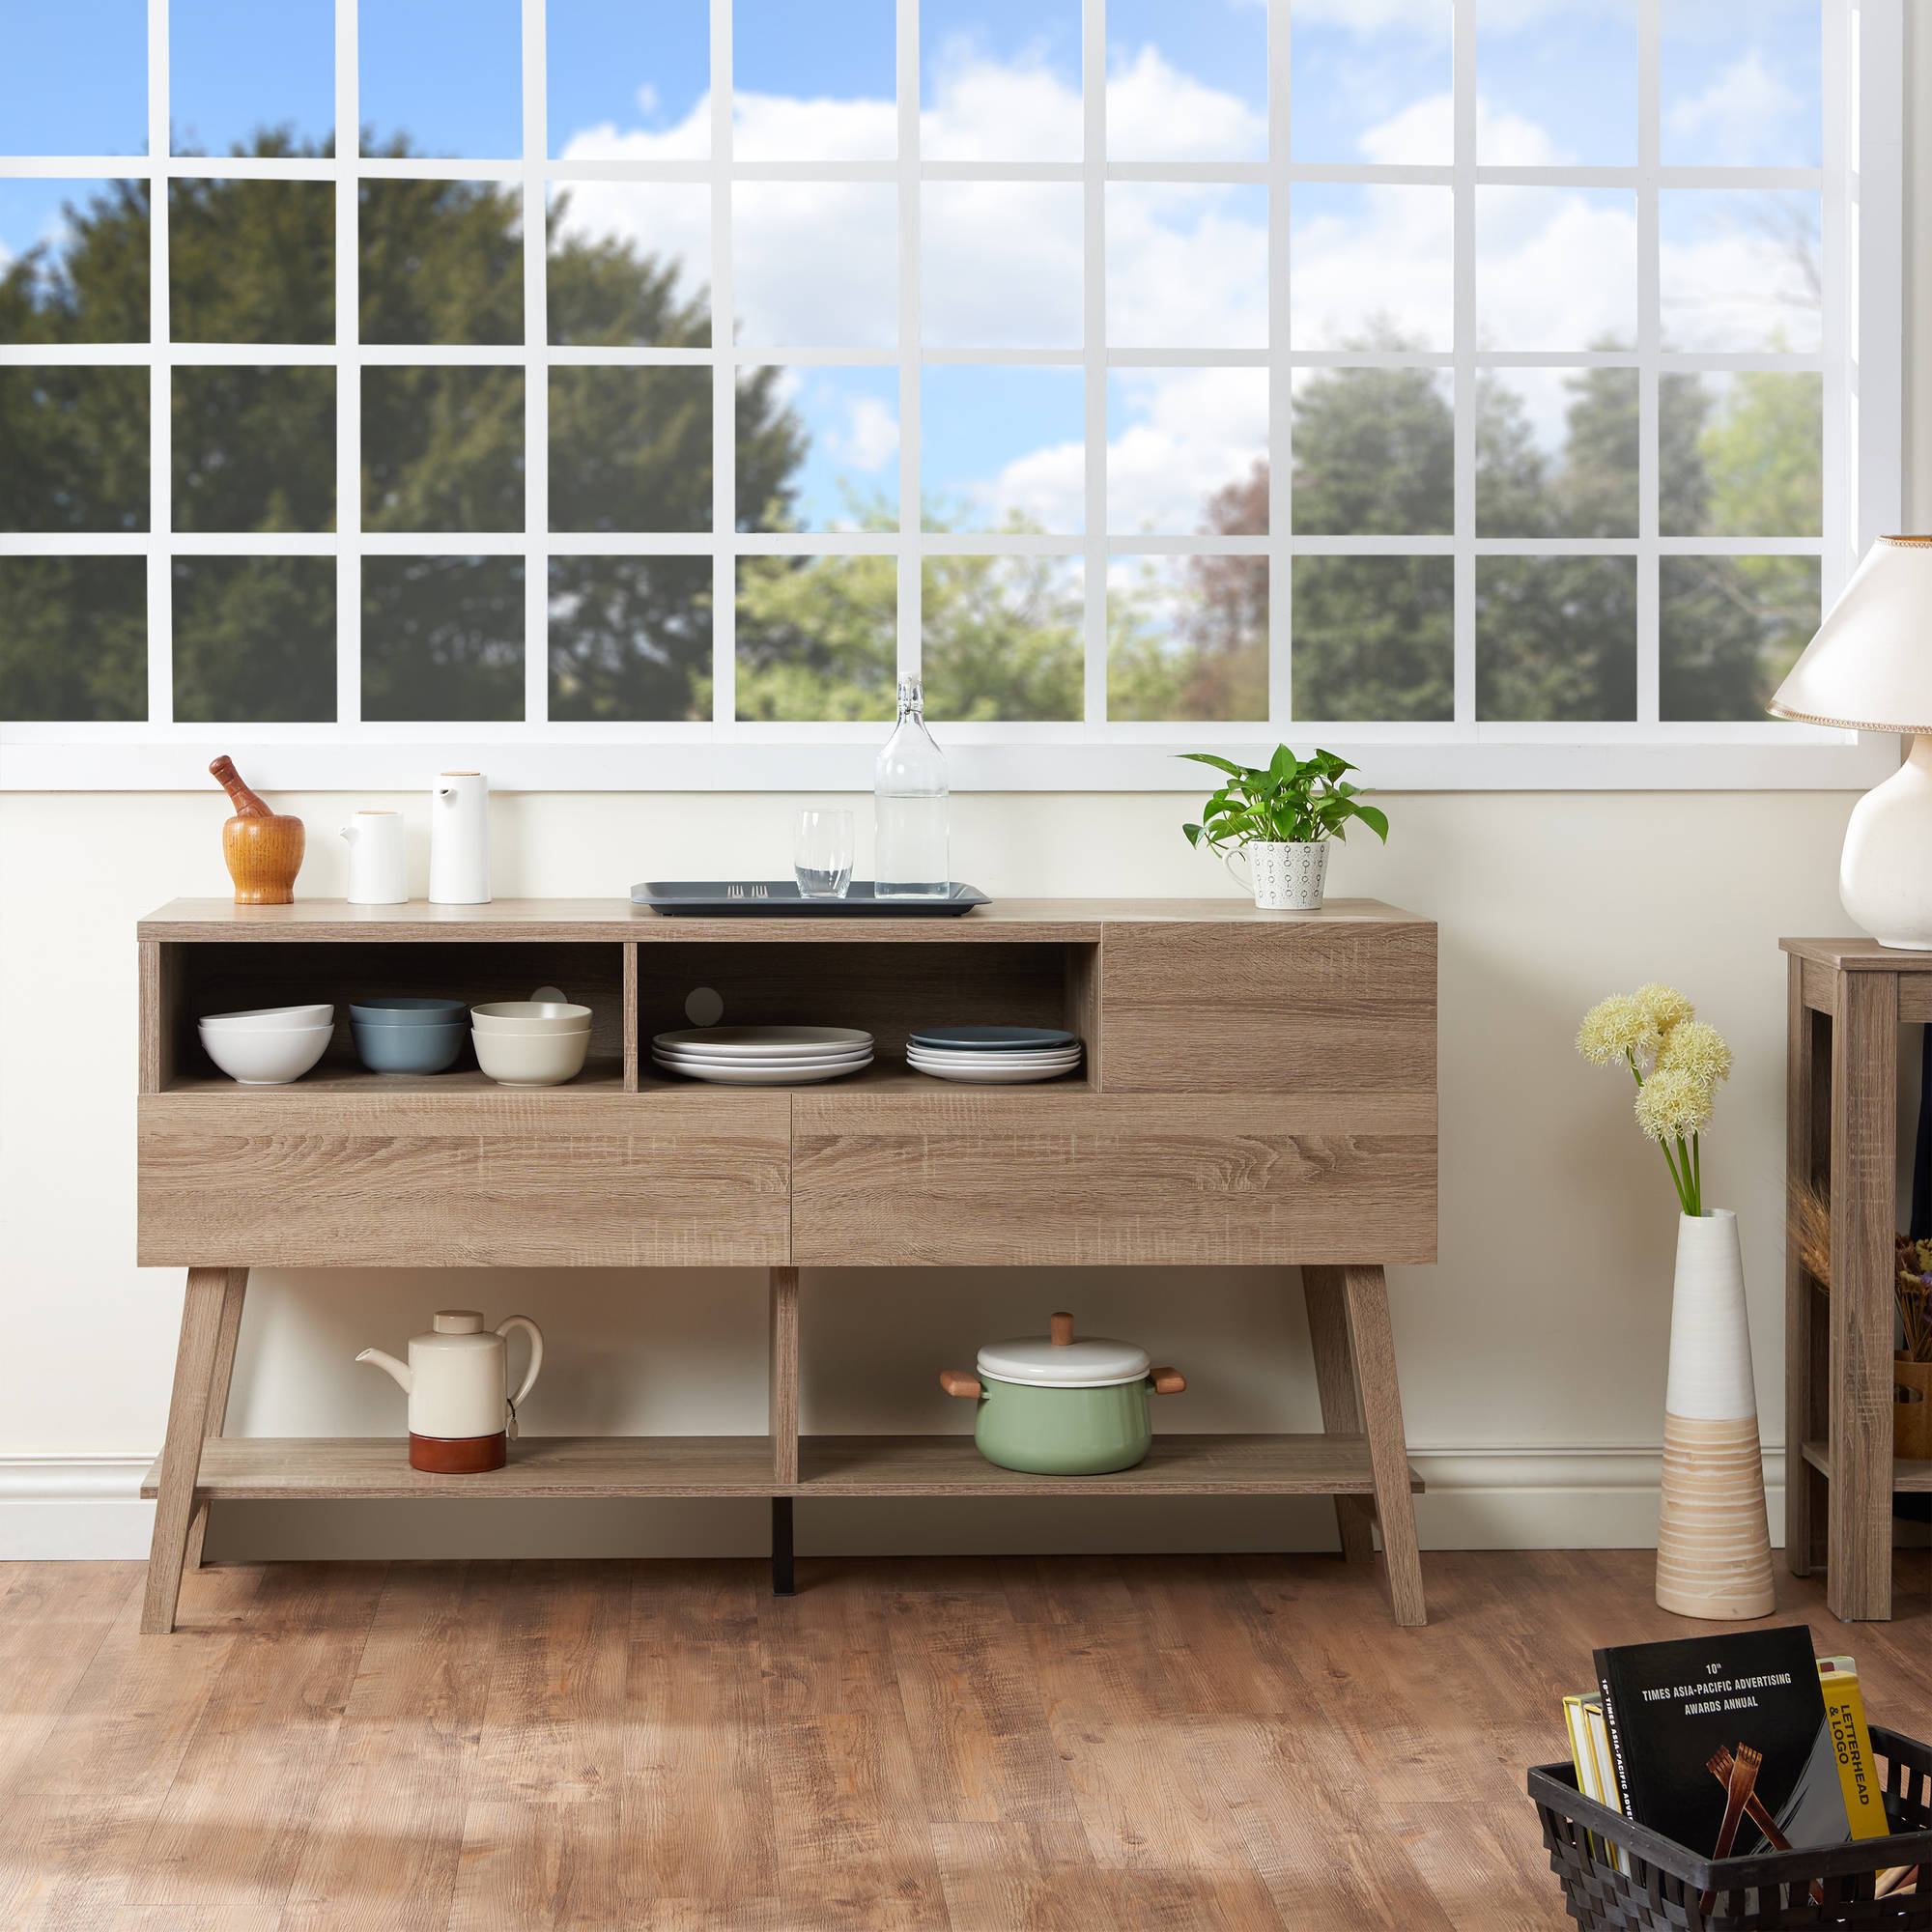 Furniture Of America Glenwood Modern Multi Storage Dining Buffet, Light Oak Regarding Contemporary Multi Storage Dining Buffets (View 18 of 30)